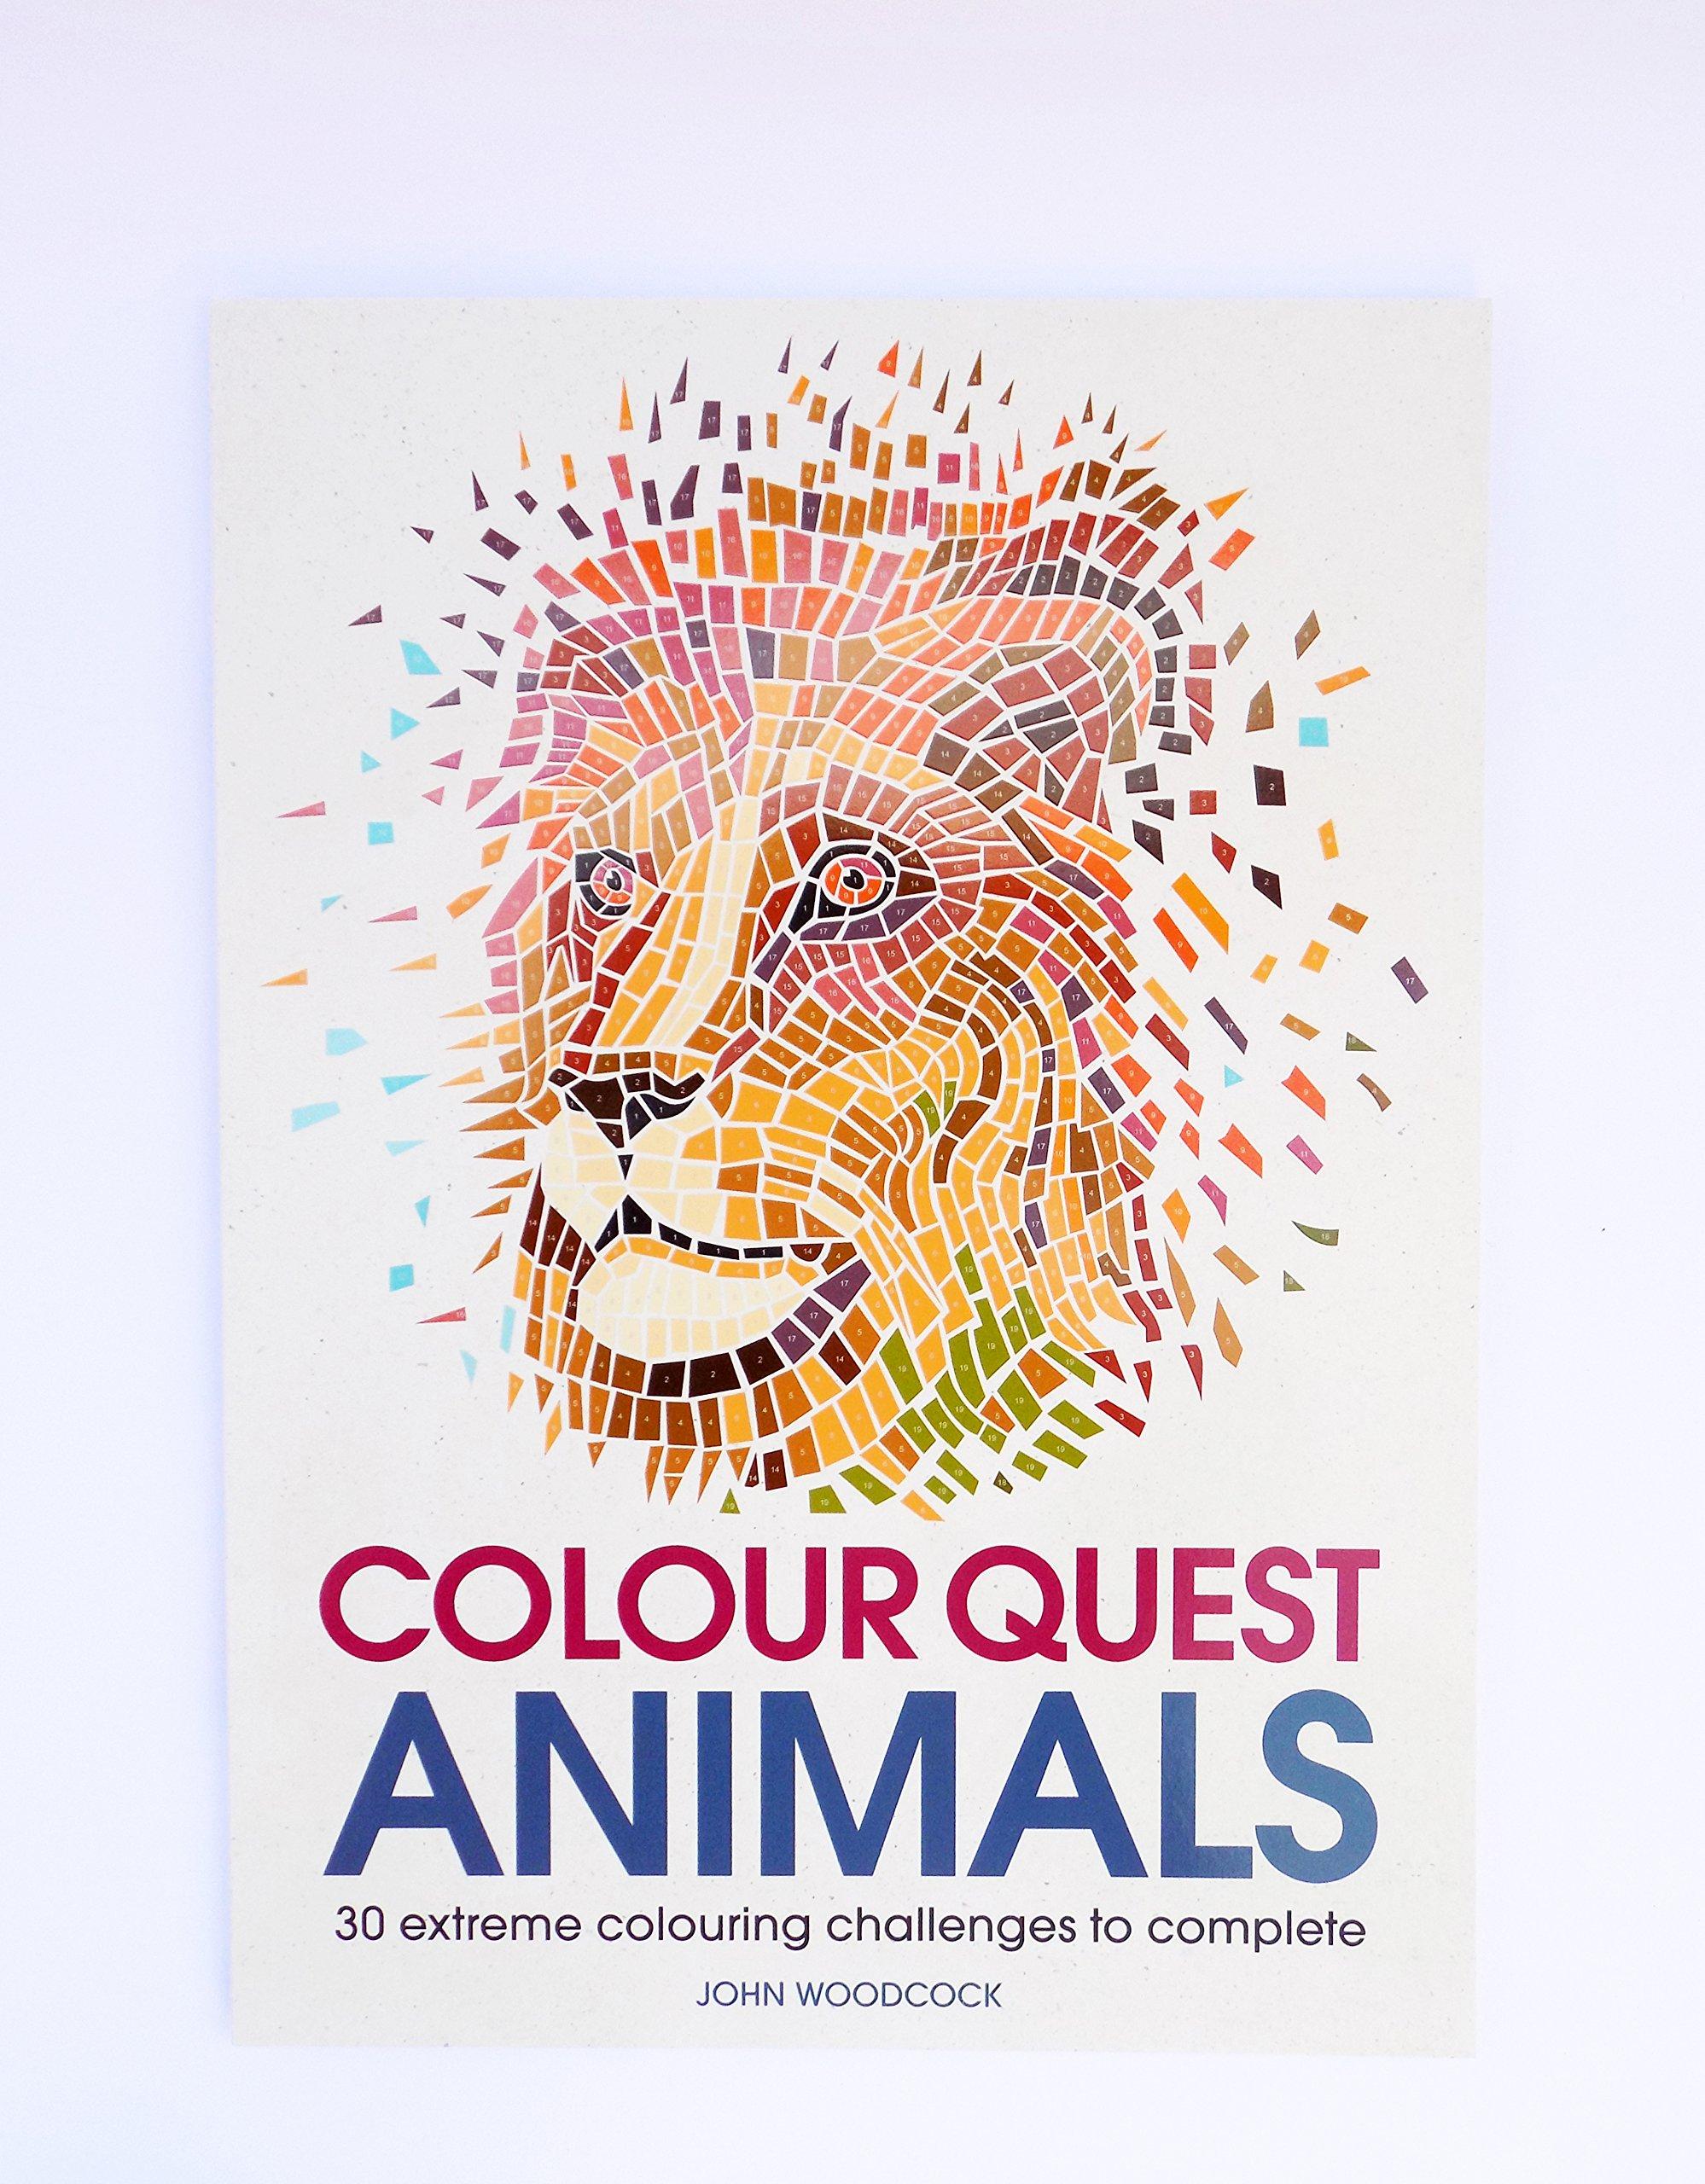 Colour Quest Animals Colouring Books Amazoncouk John Woodcock 9781782437130